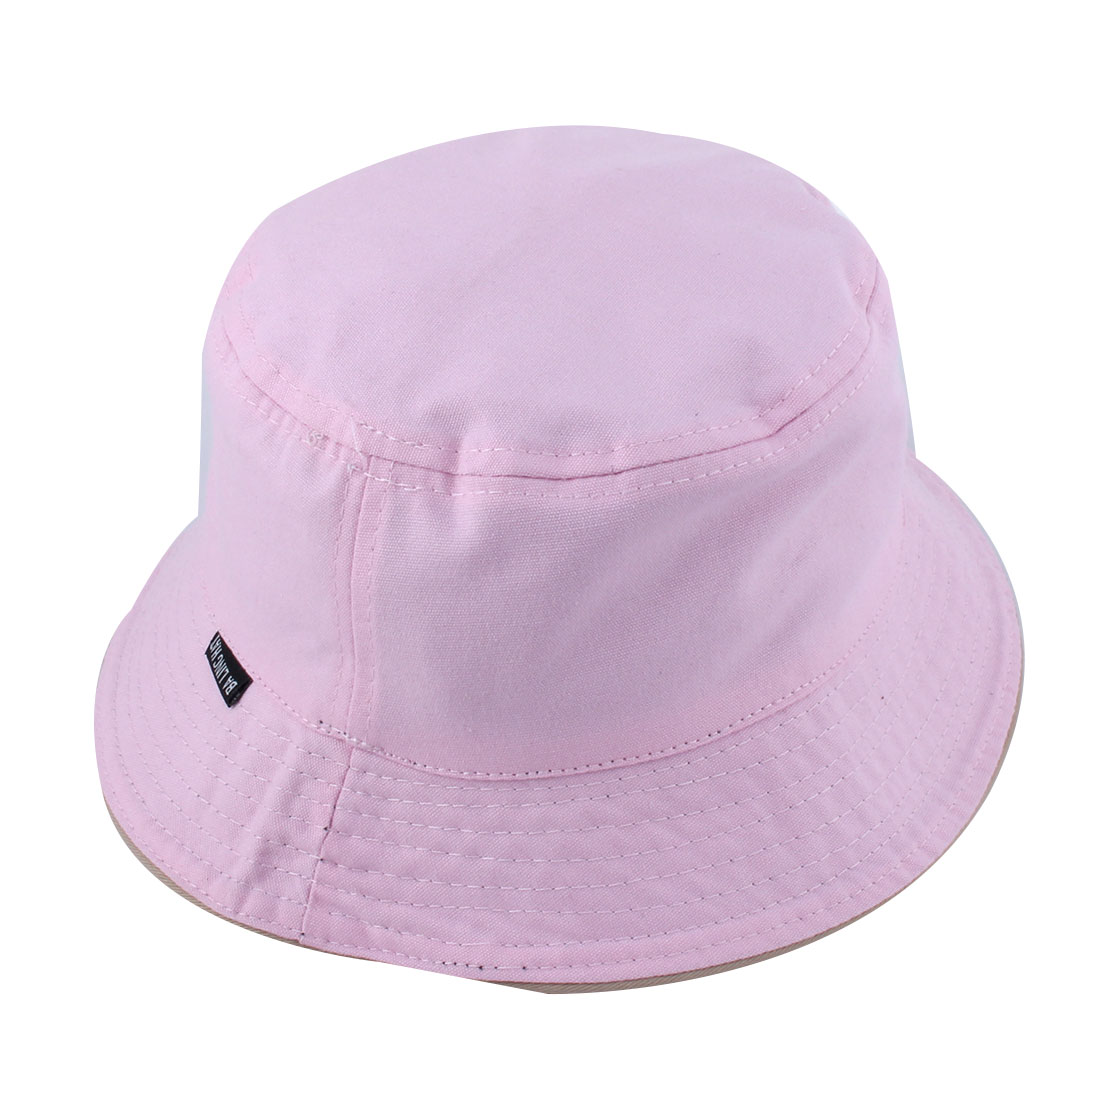 Fisherman Woman Outdoor Fishing Hiking Holiday Climbing Hunting Summer Sun Protective Cap Bucket Hat Pink